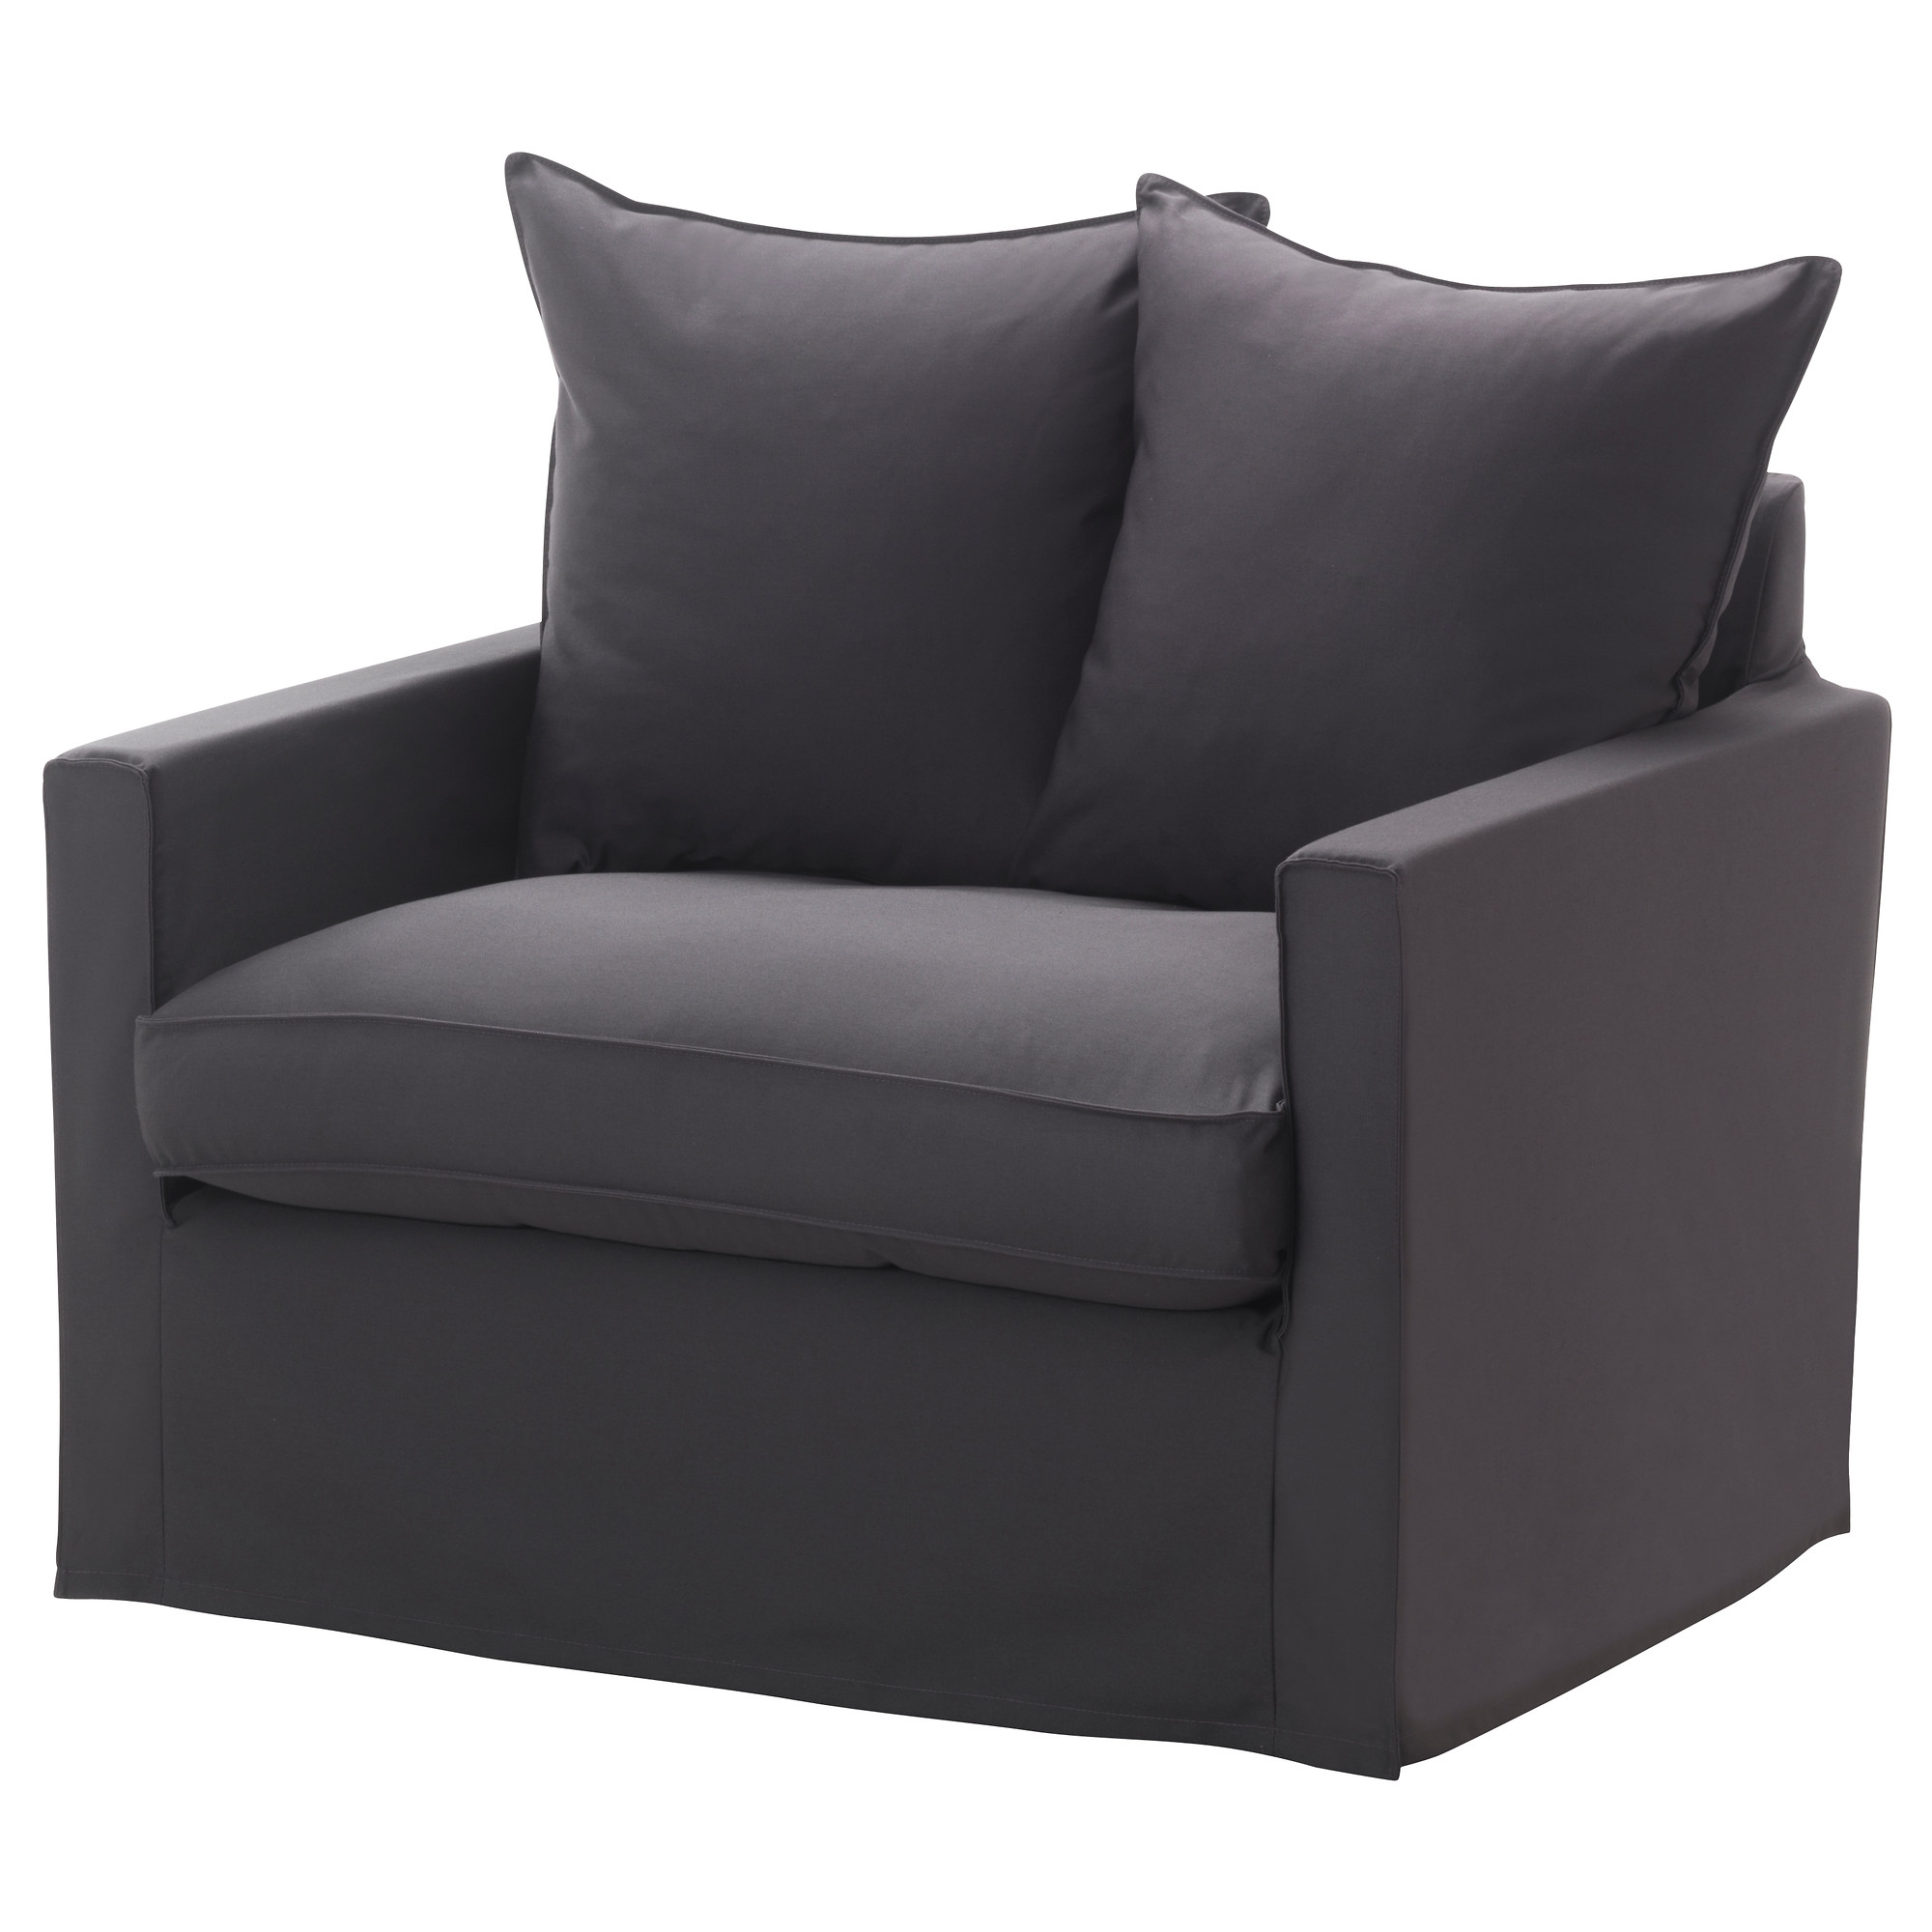 Ikea tenerife detalles producto - Sillones pequenos ikea ...